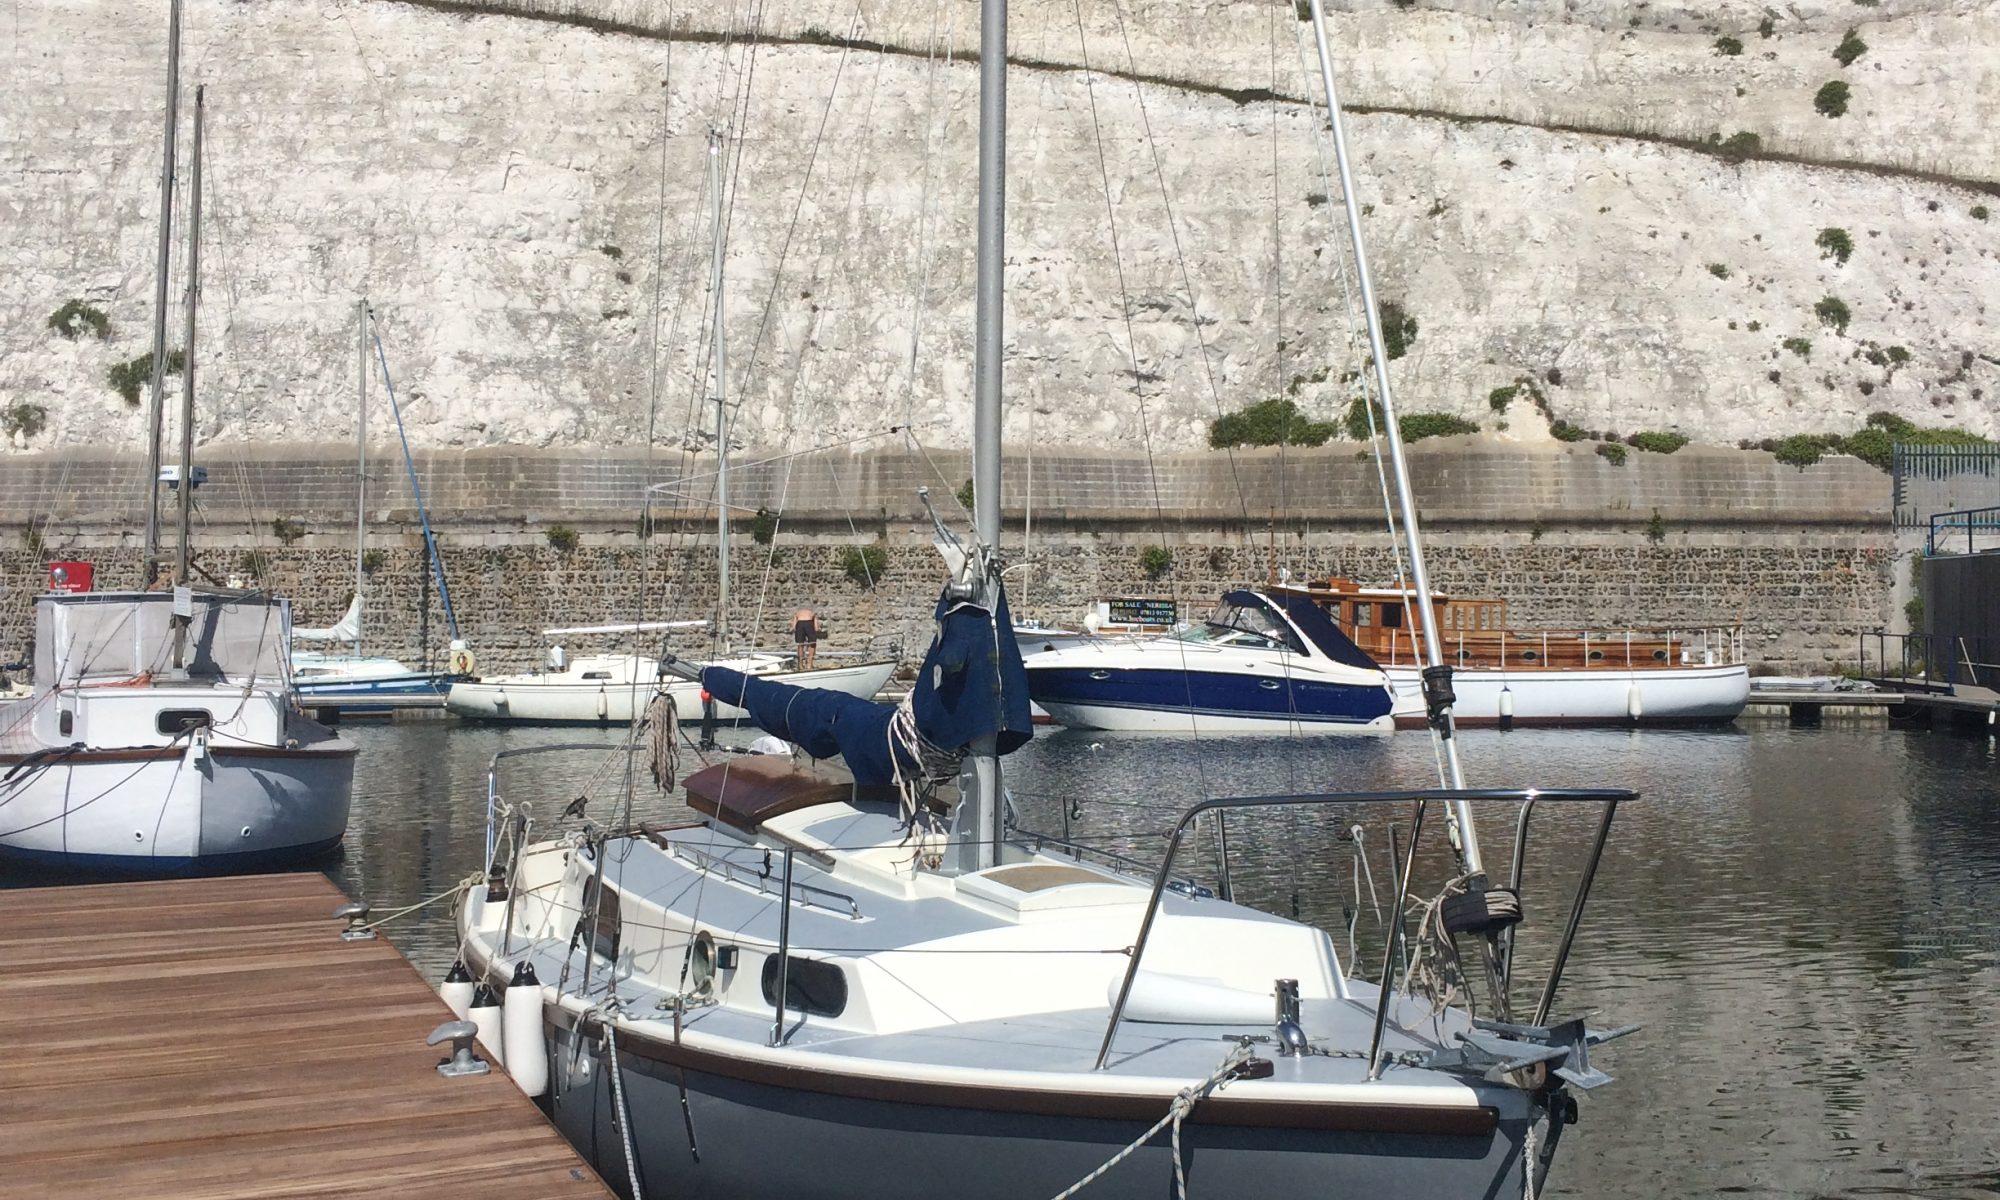 Macwester sailing boat in marina